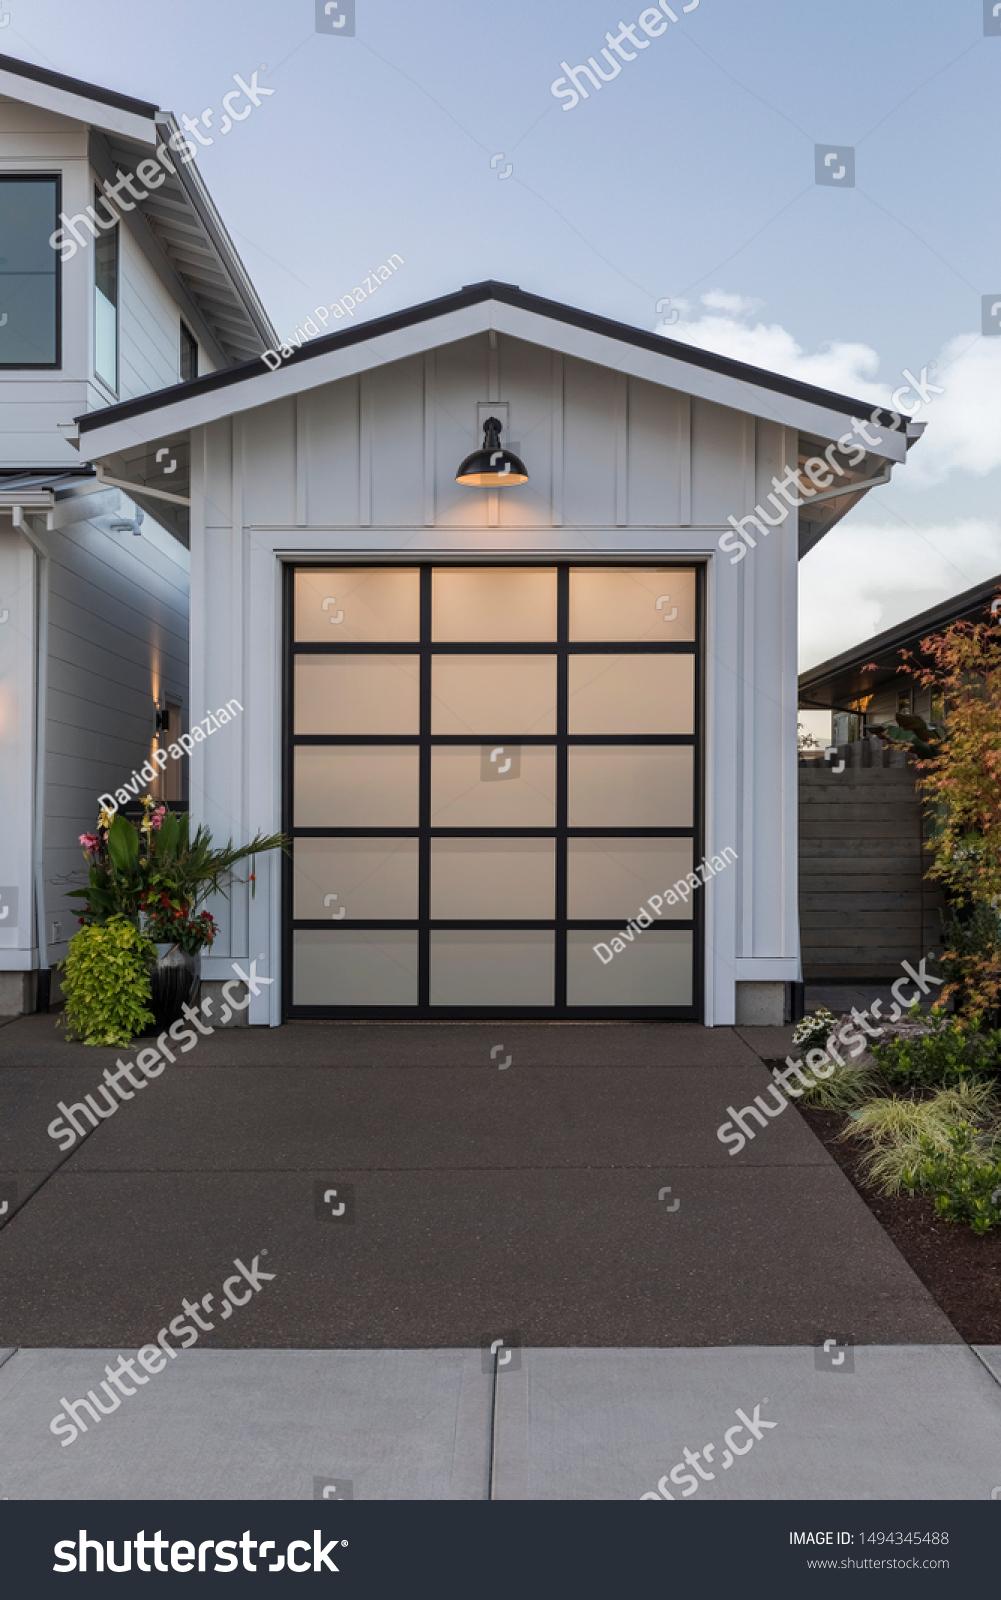 Garage Door Modern Farmhouse Style Home Stock Photo Edit Now 1494345488